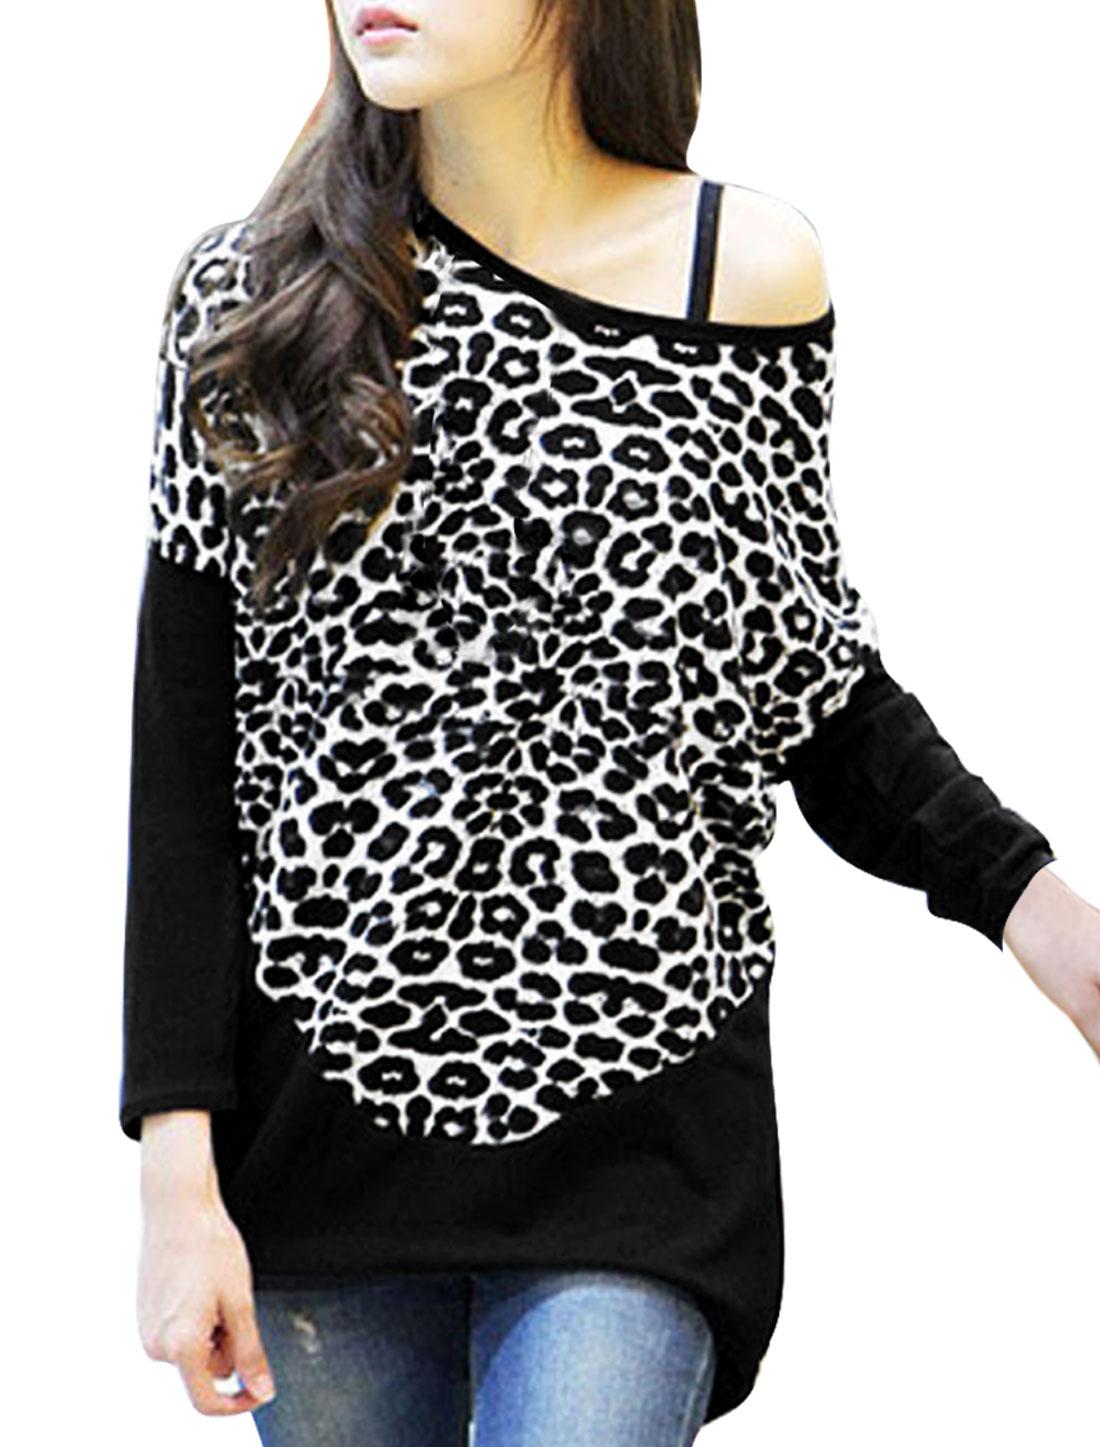 Women Black Long Sleeve Leopard Prints Knit Tunic Shirt S